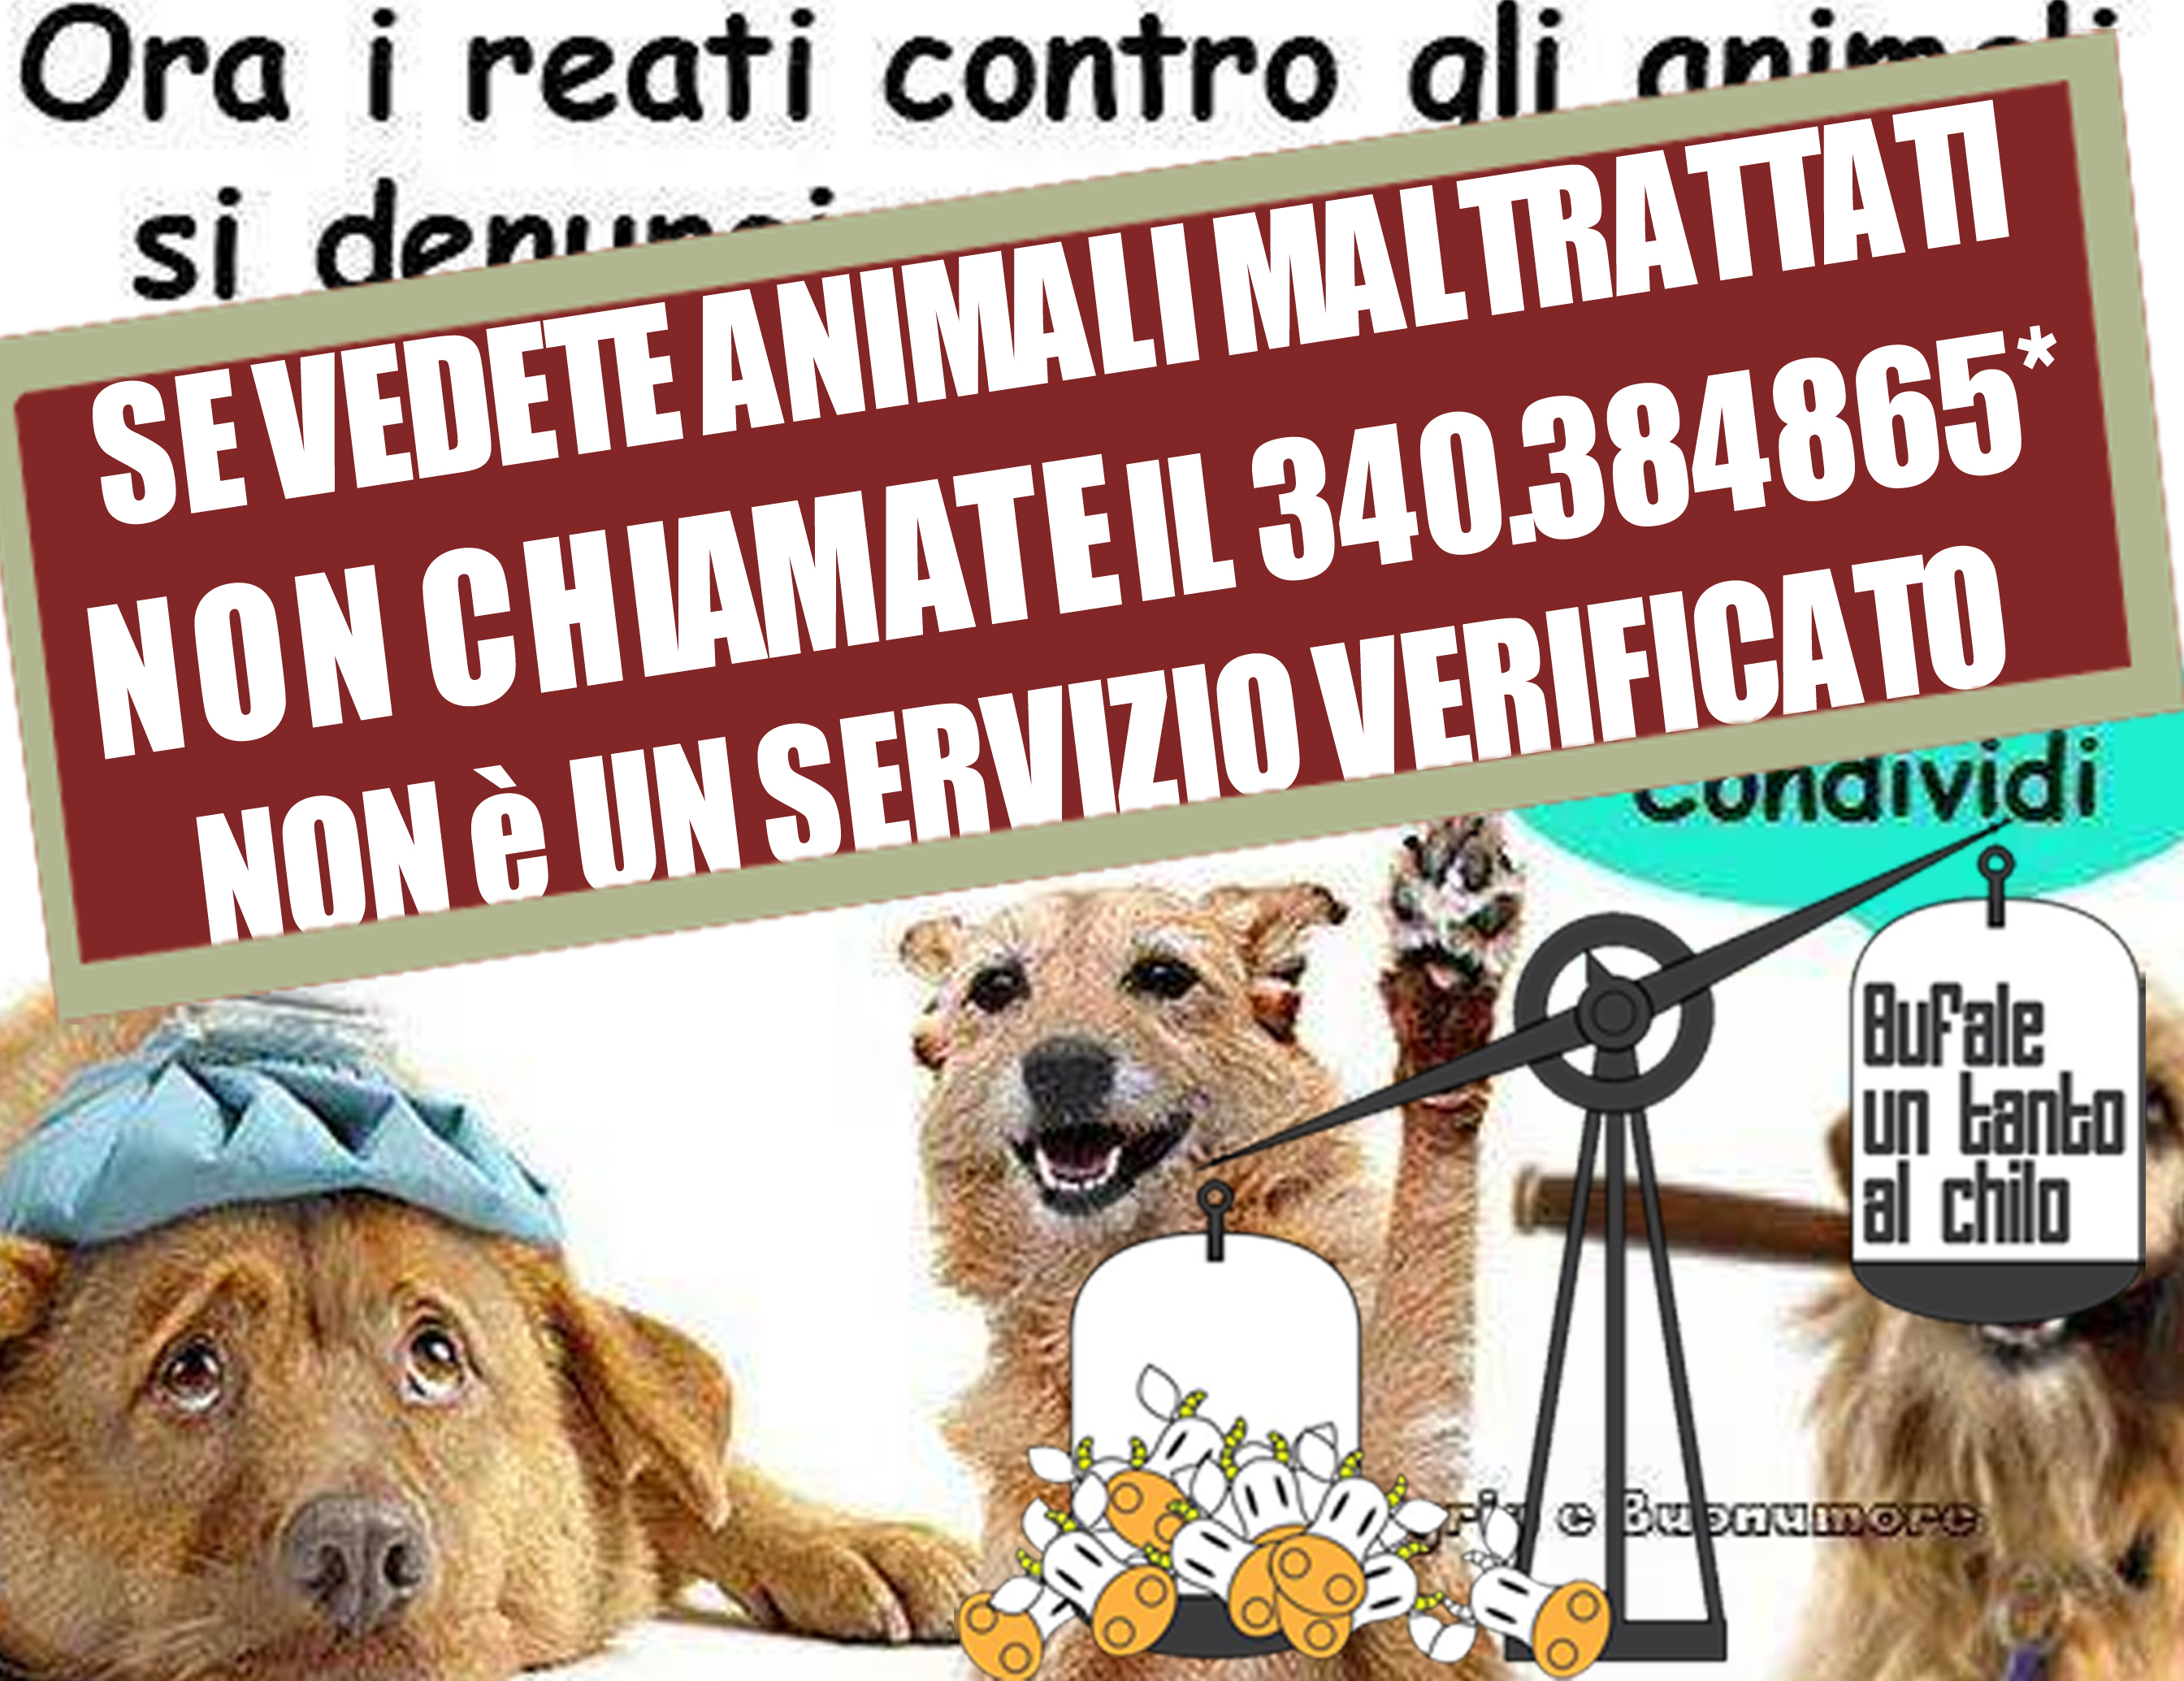 ANIMALIMALTRATTATIAIDAA